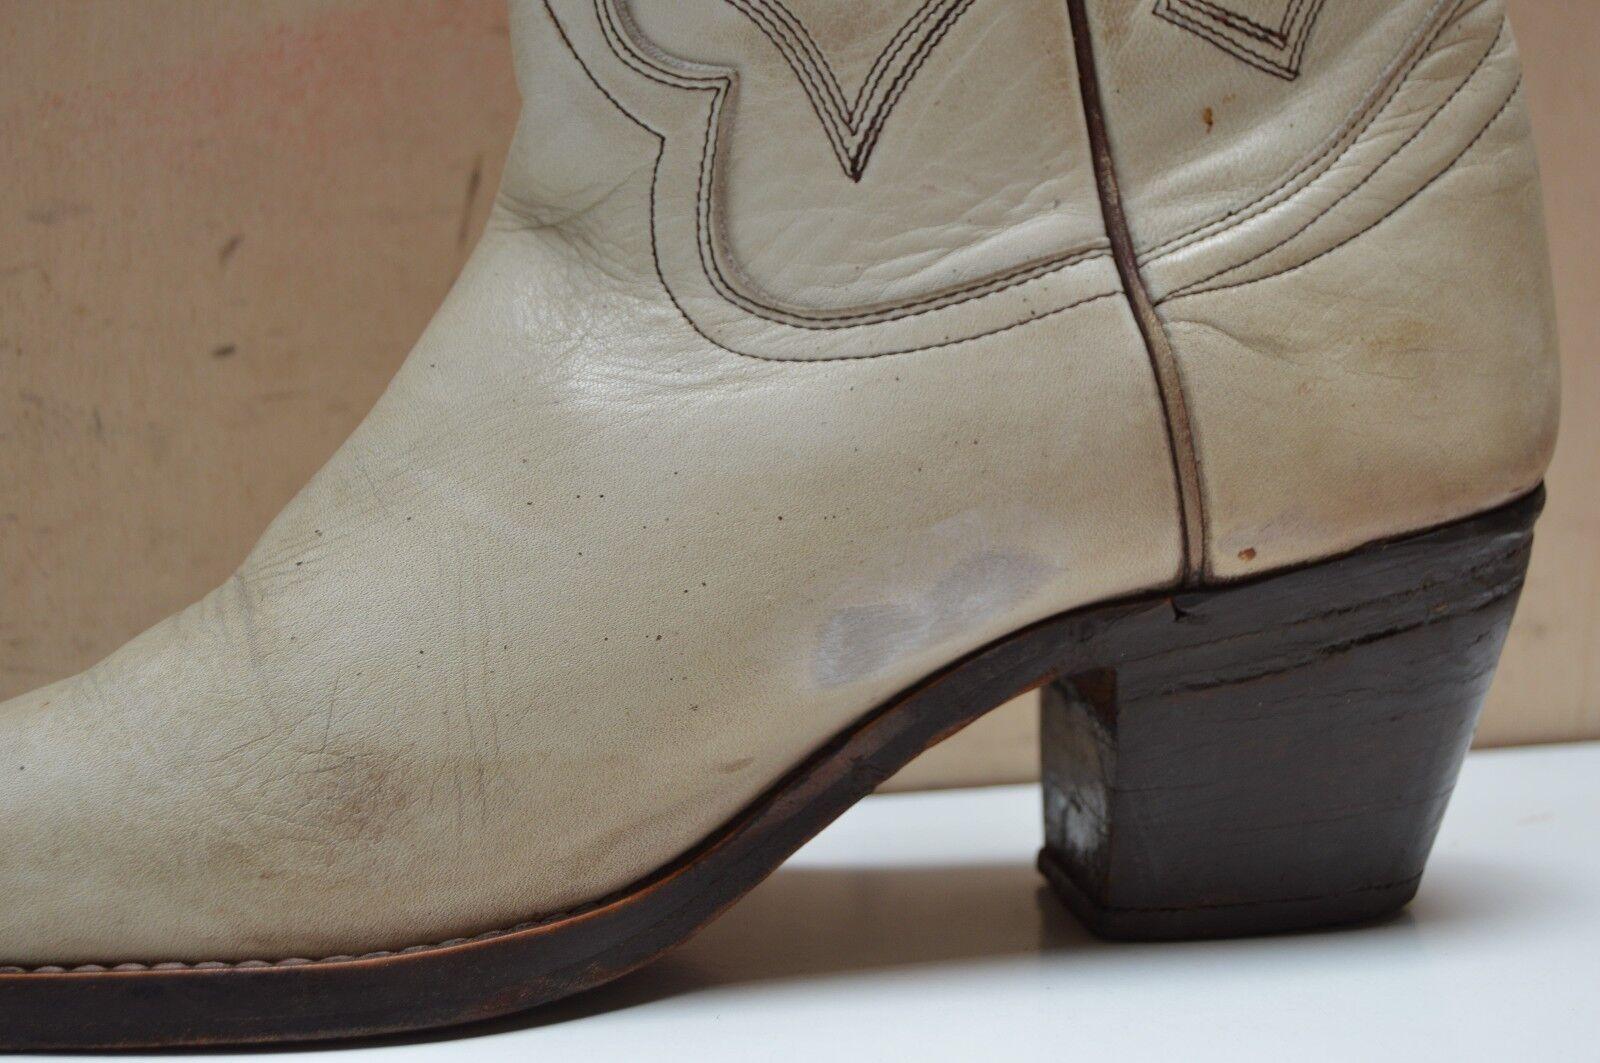 Westernstiefel Boots made spain handmade Biker UK 8,5 Stiefel stivali Biker handmade Boots c99150